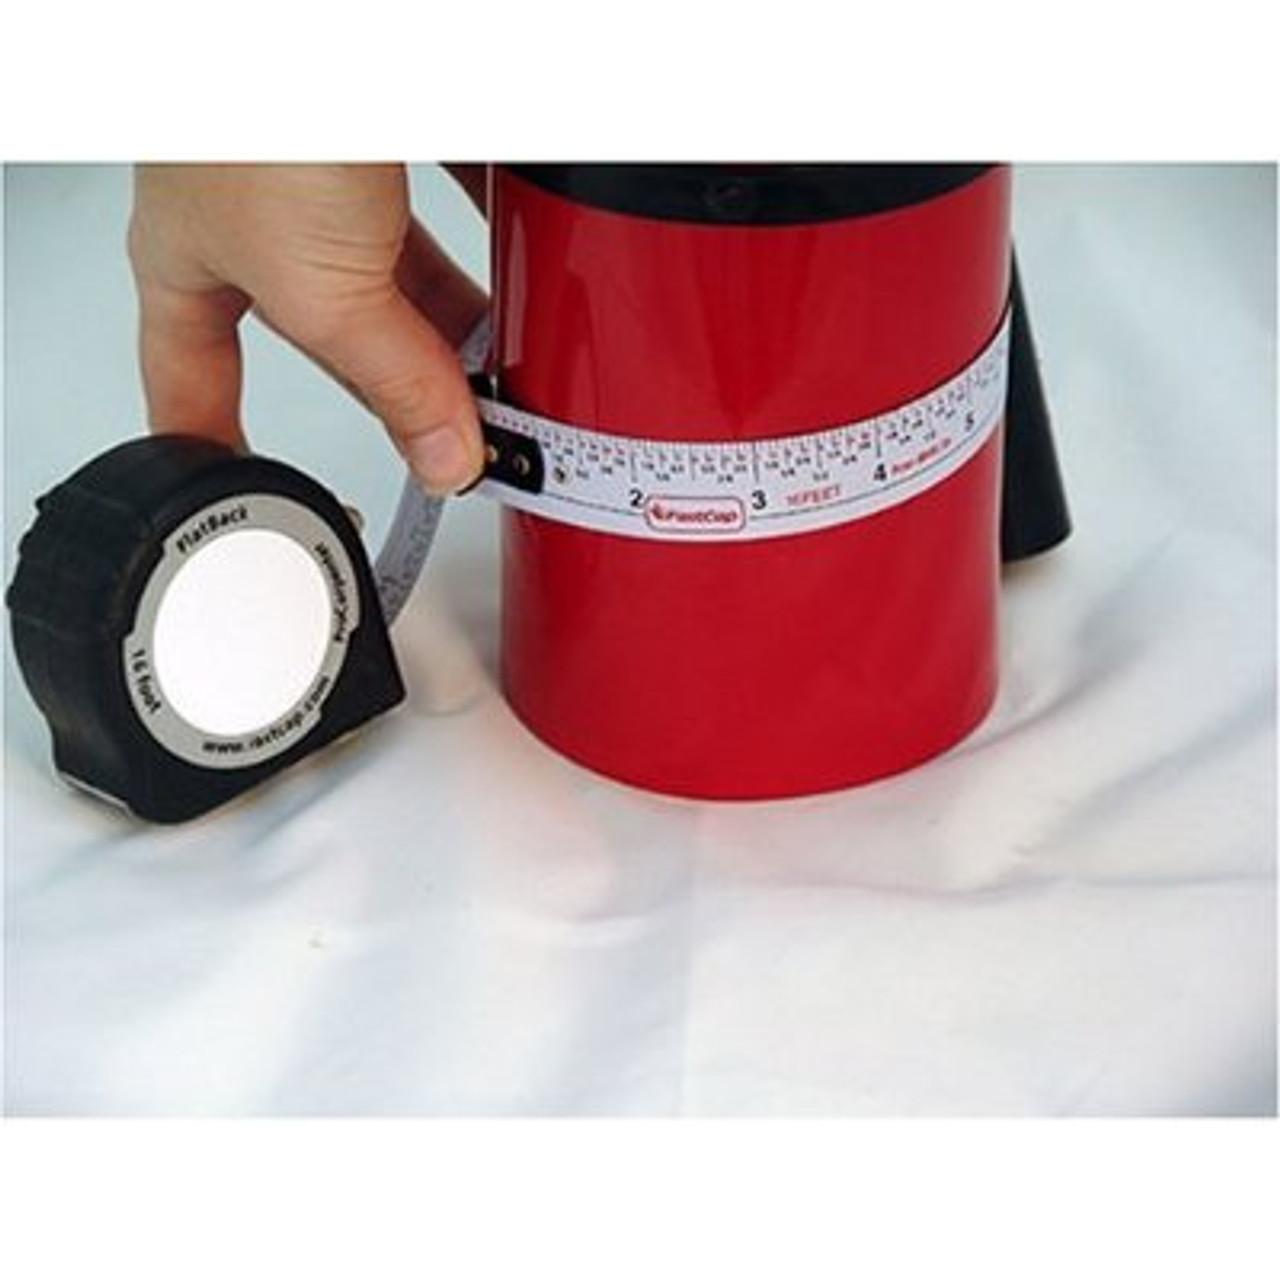 Flatback Story Pole Measuring Tape 16 FT measuring  circle